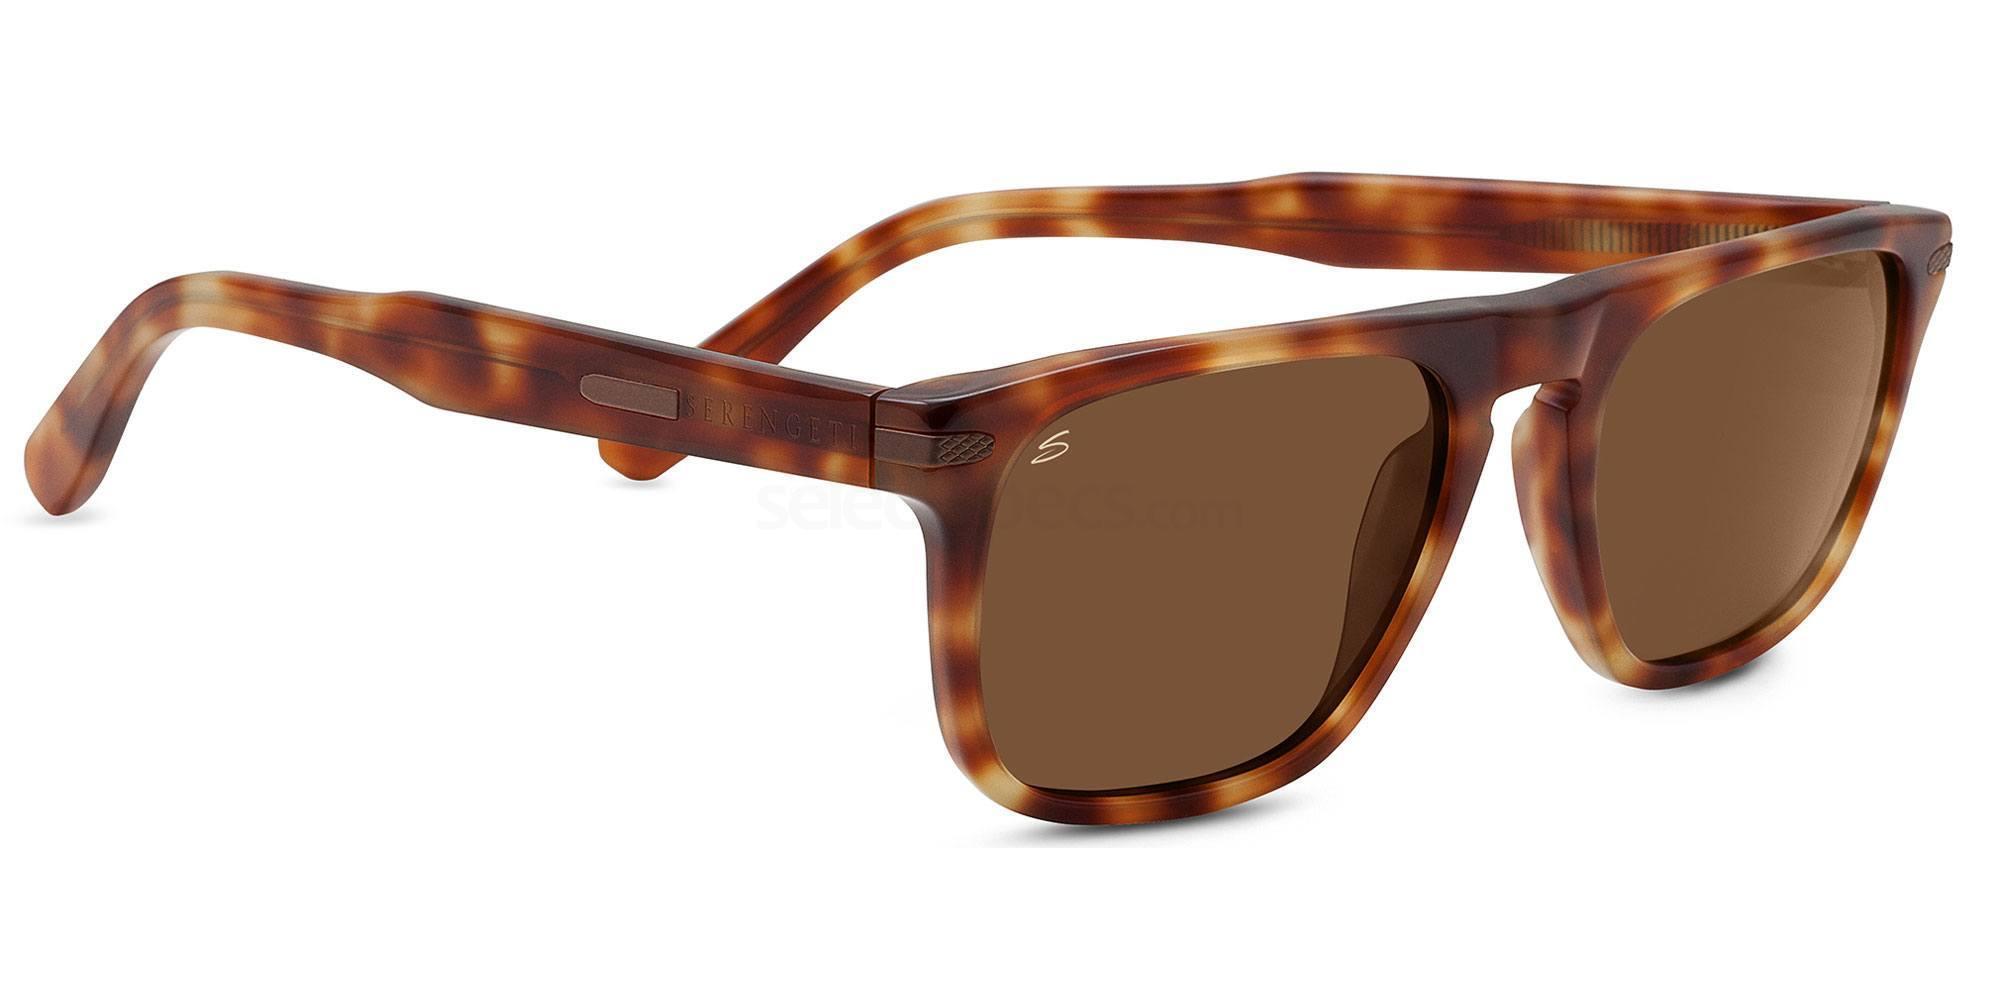 8151 Cosmopolitan ENRICO Sunglasses, Serengeti